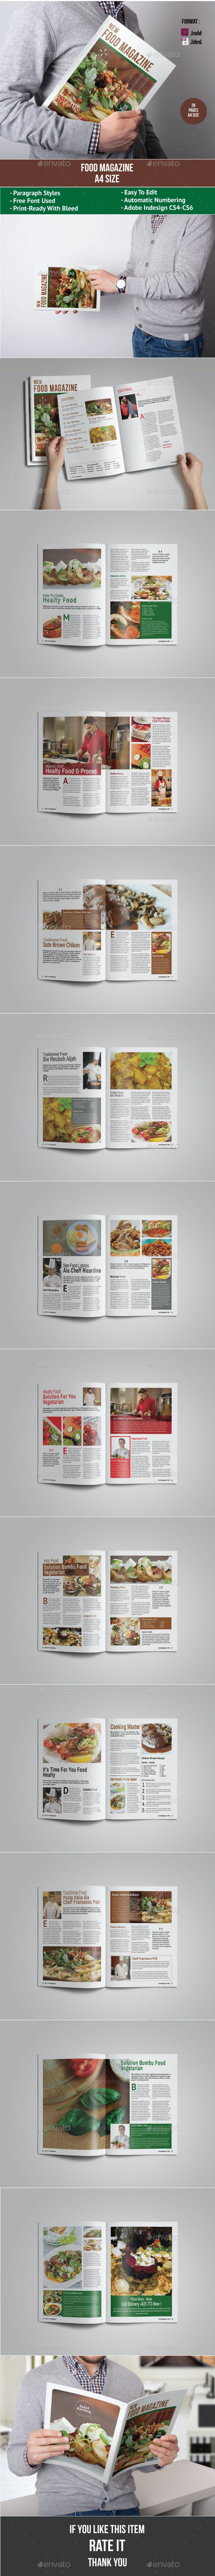 Food Magazine - Magazines Print Templates